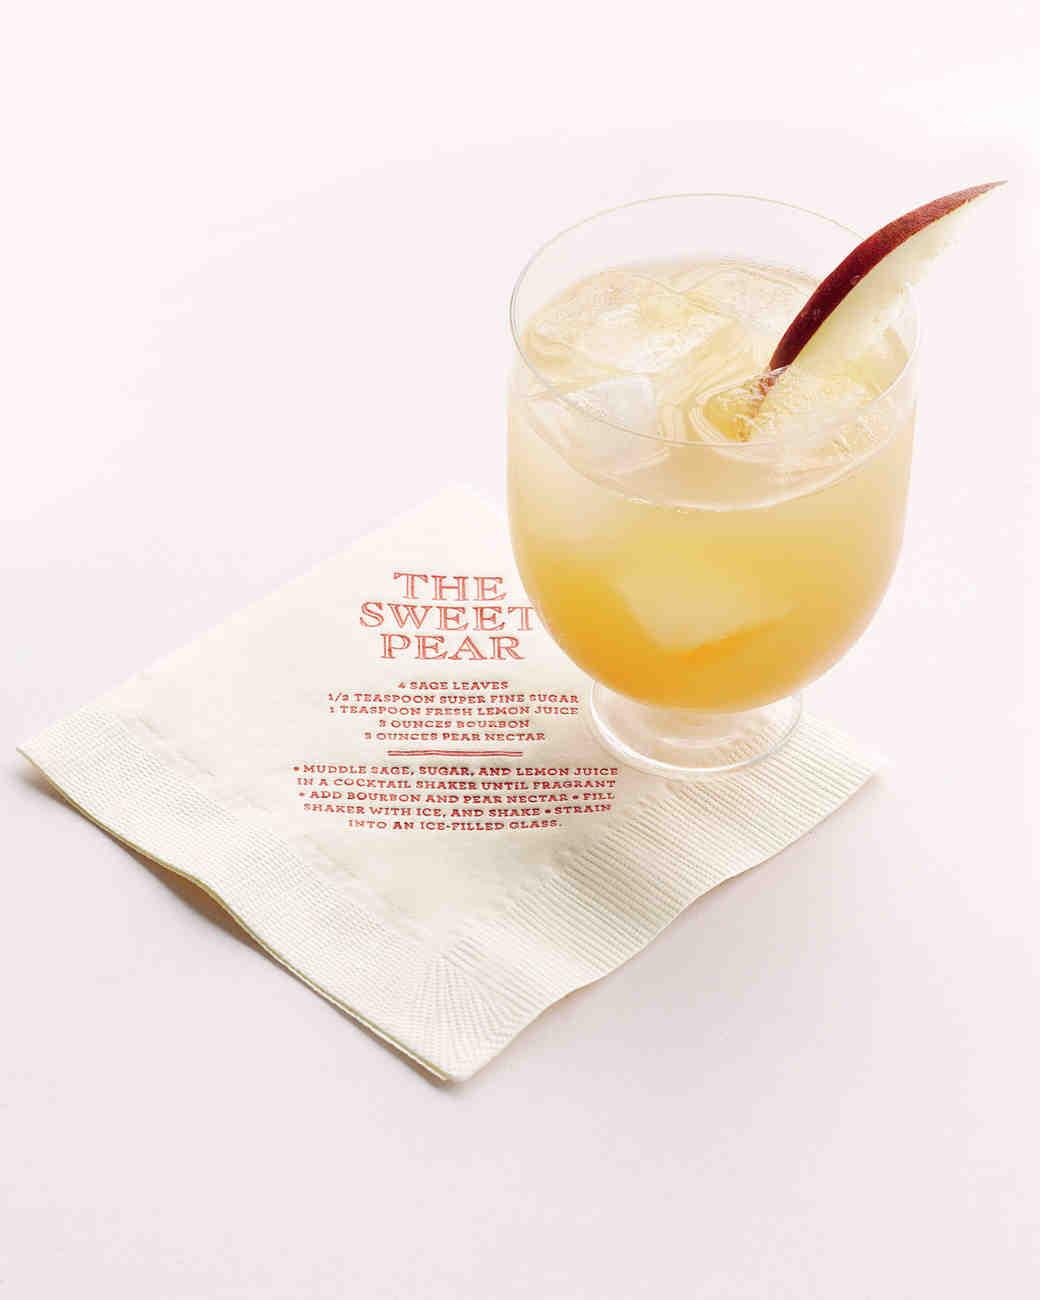 pear-drink-gt-mwd107748.jpg